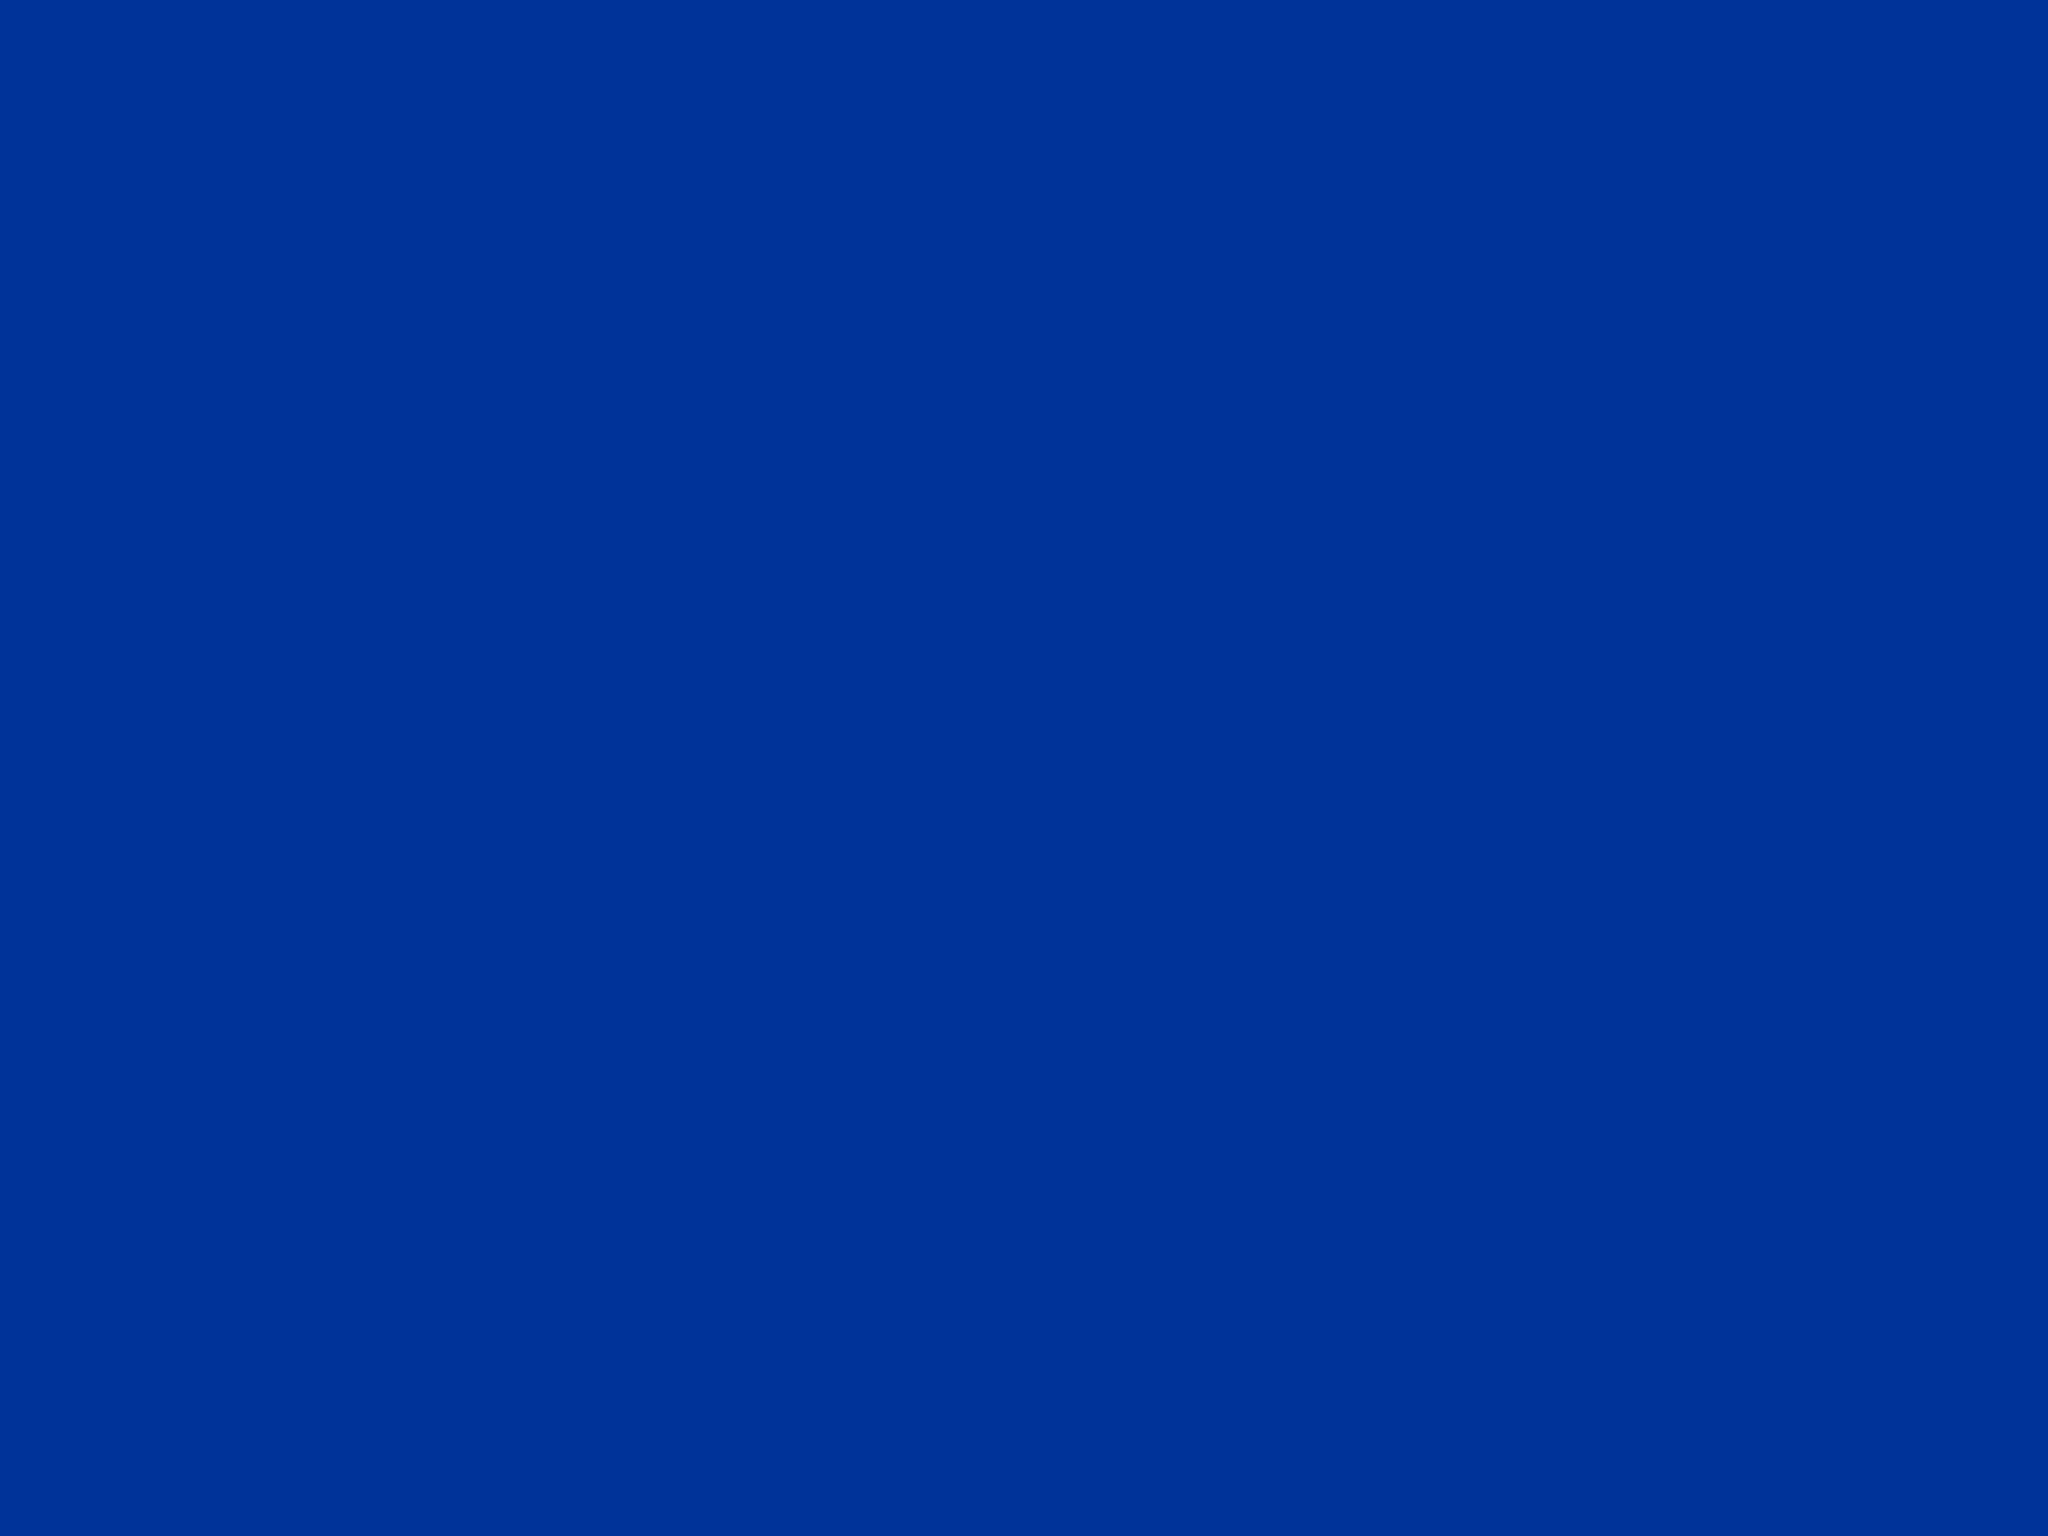 2048x1536 Smalt Dark Powder Blue Solid Color Background